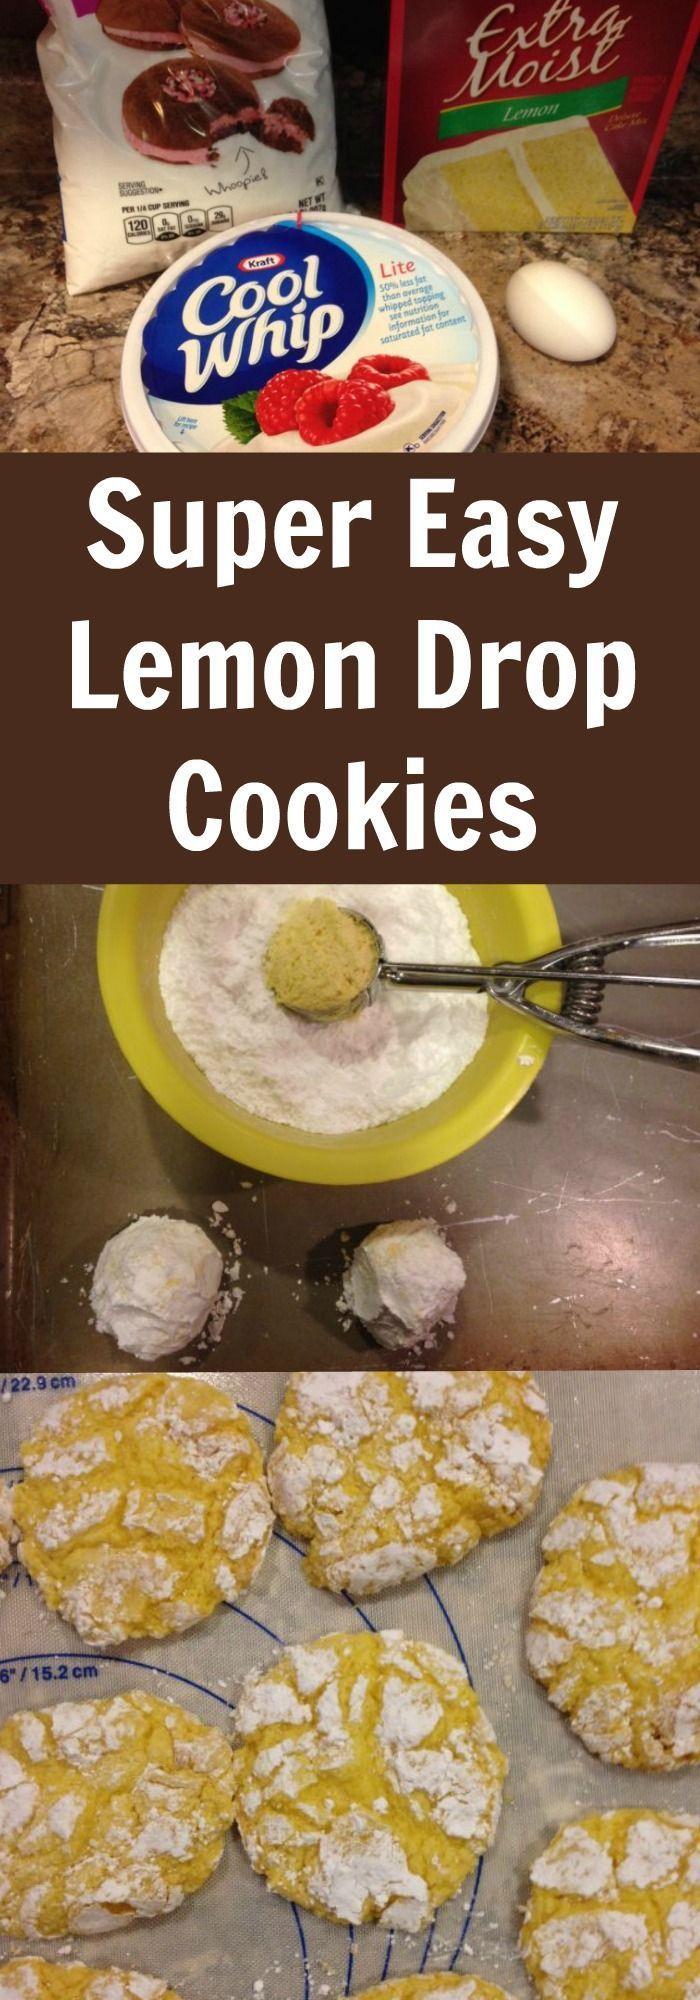 Super Easy Lemon Drop Cookie Recipe - I love these cookies!!